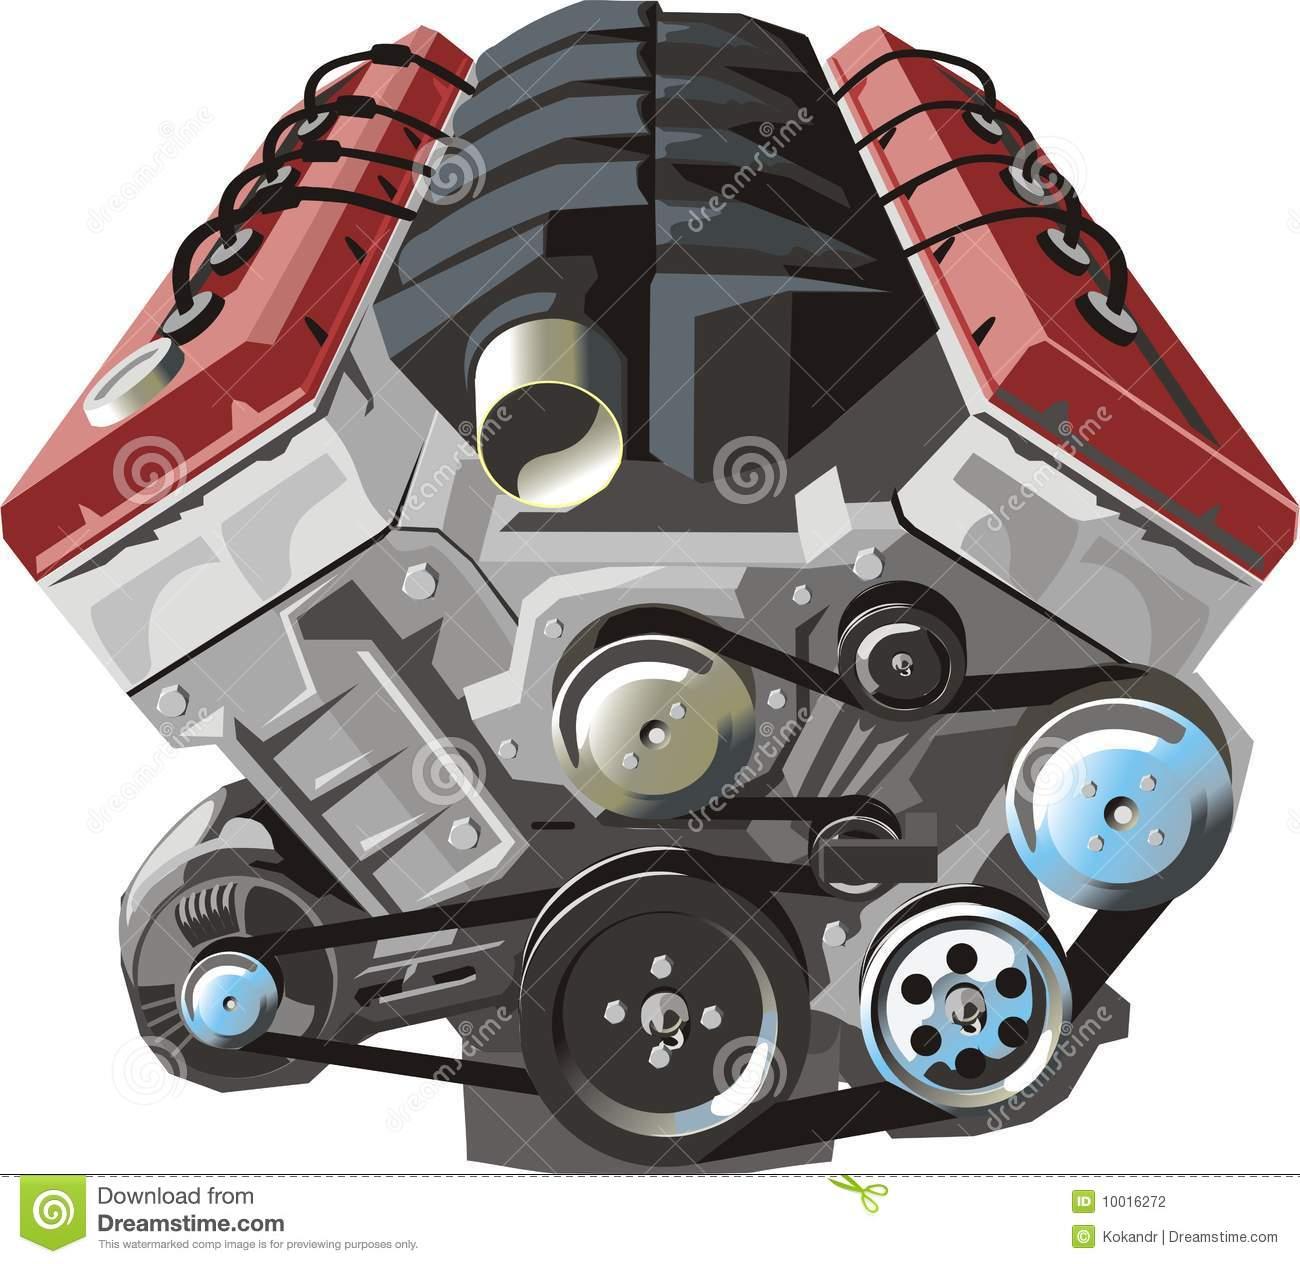 Motor clipart #15, Download drawings